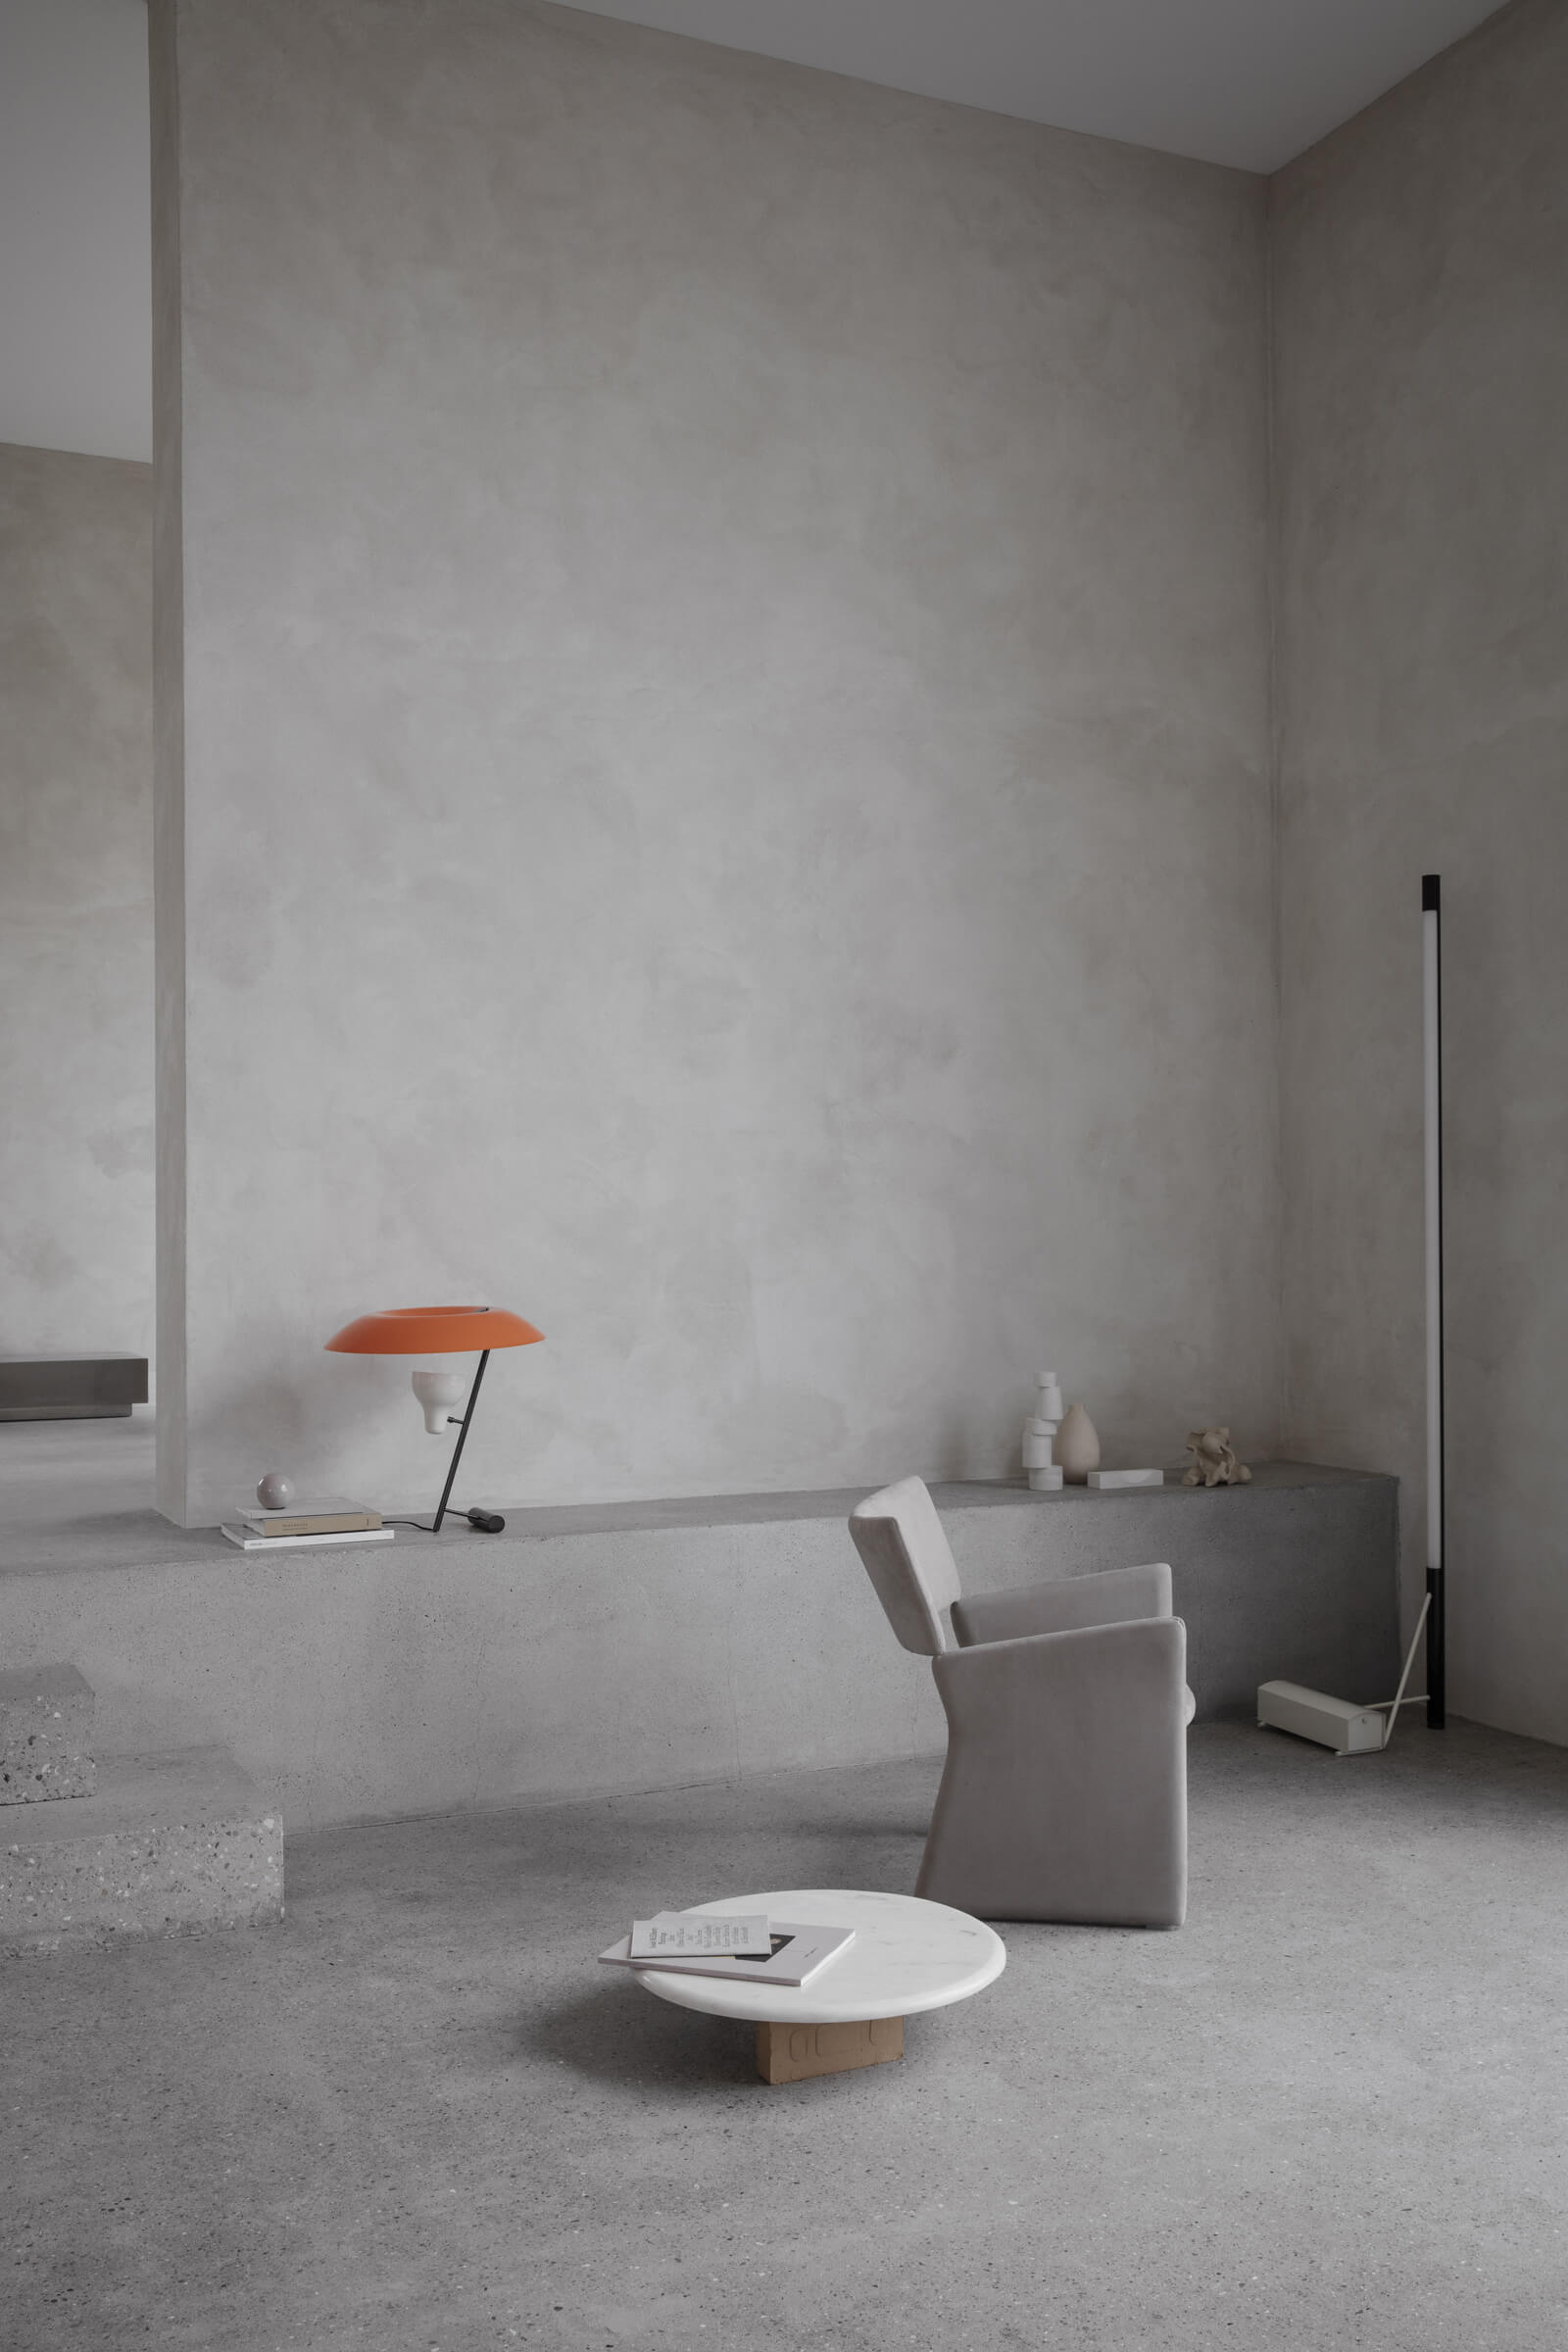 TinnappelMetz-Berlin-Astep-Model-1063-Gino-Sarfatti_02